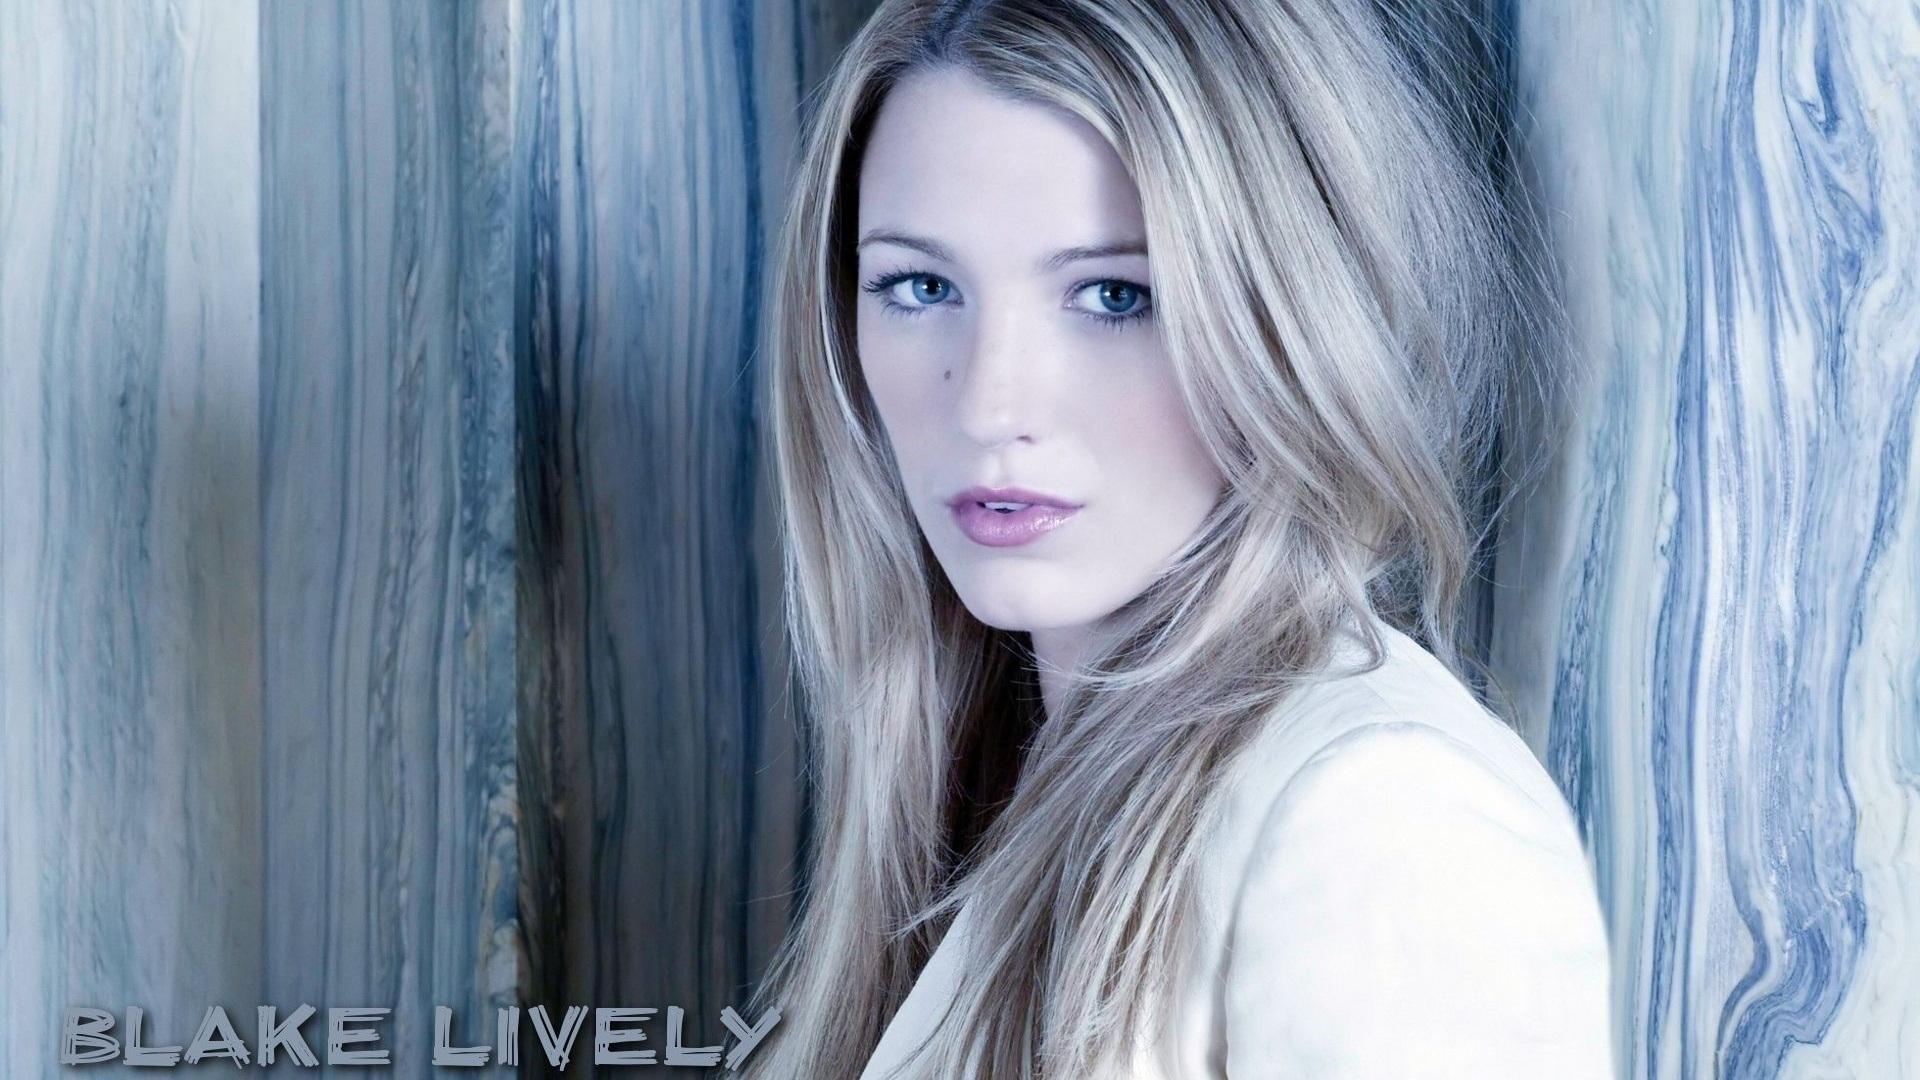 Blake-Lively-01_1920x1...